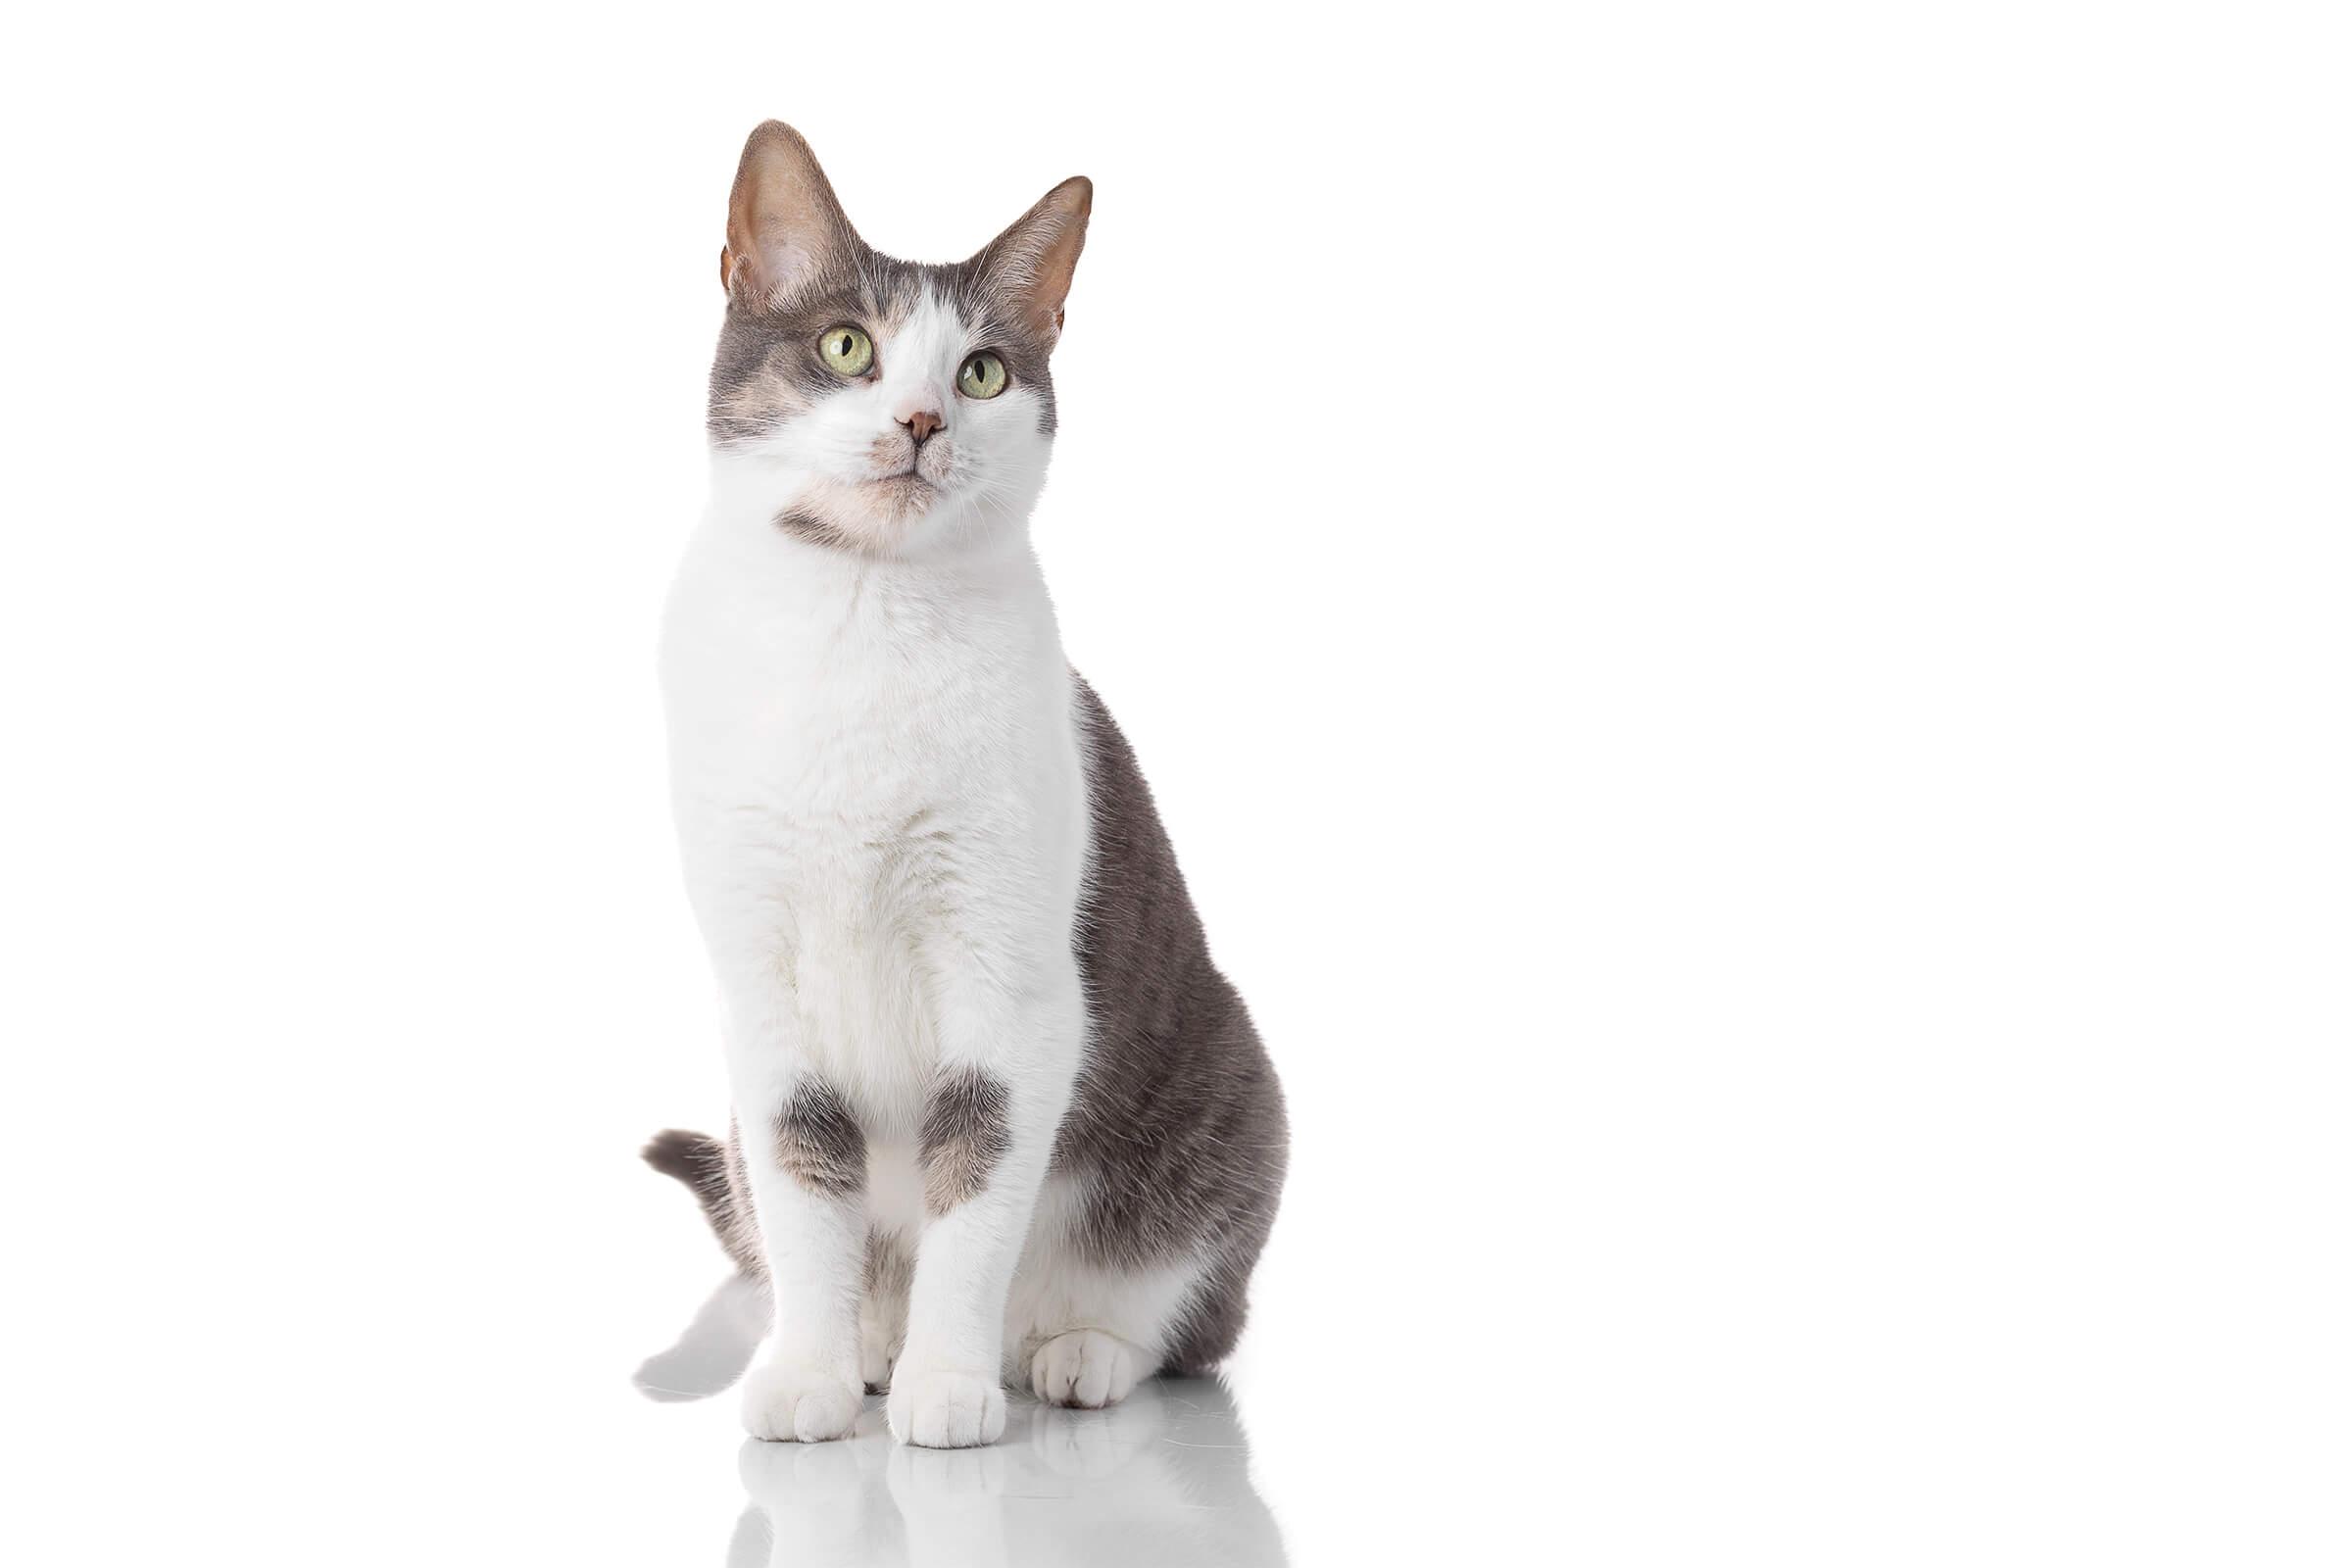 cat on white plexiglass in ad